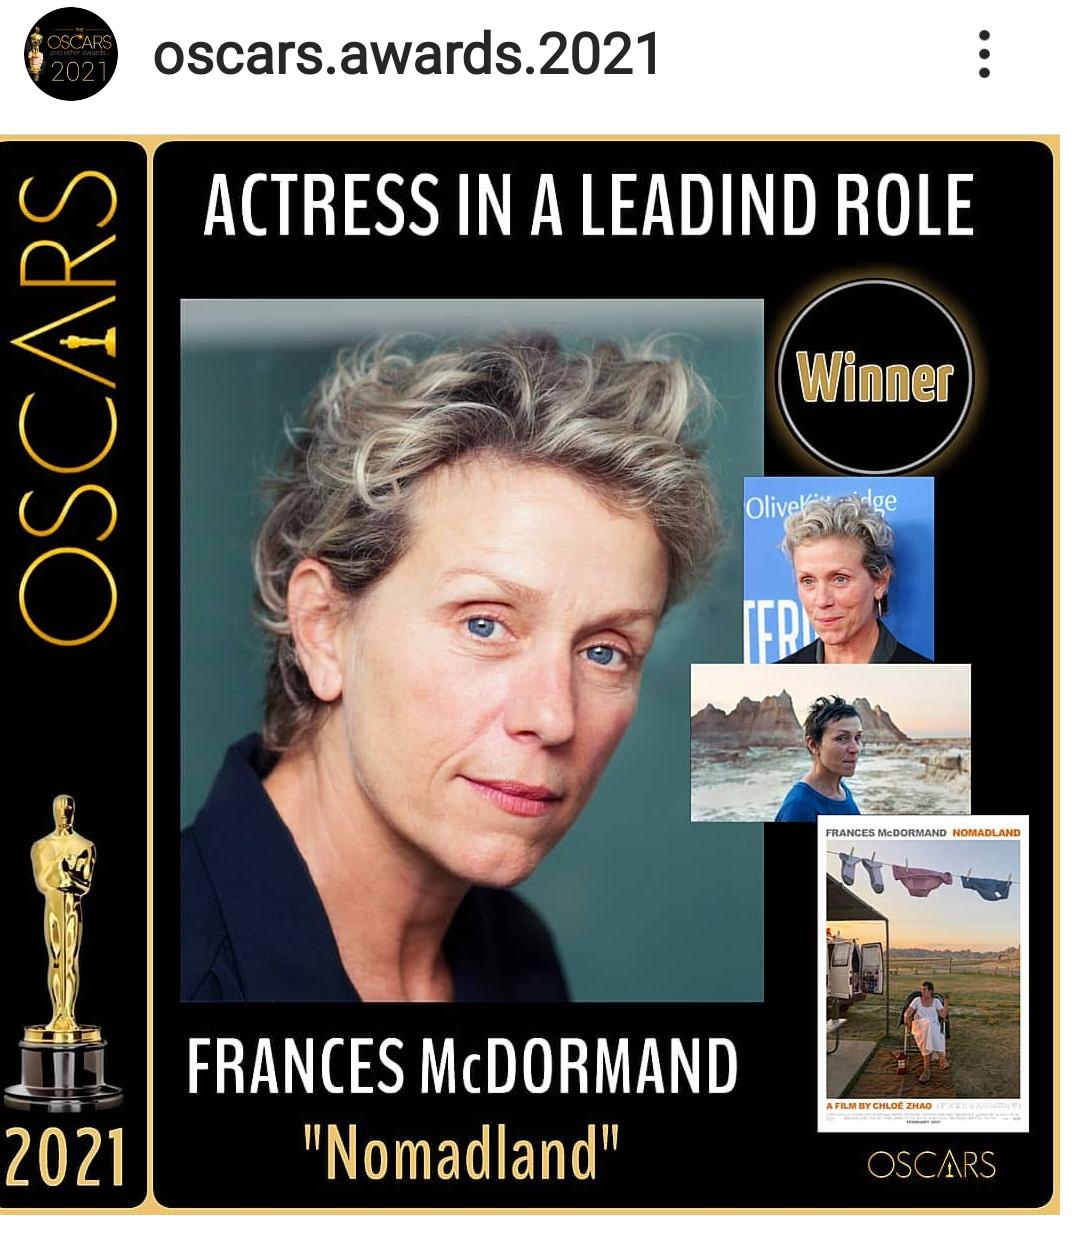 OSCAR 2021: FRANCES MCDORMAND E' LA DONNA D'ORO